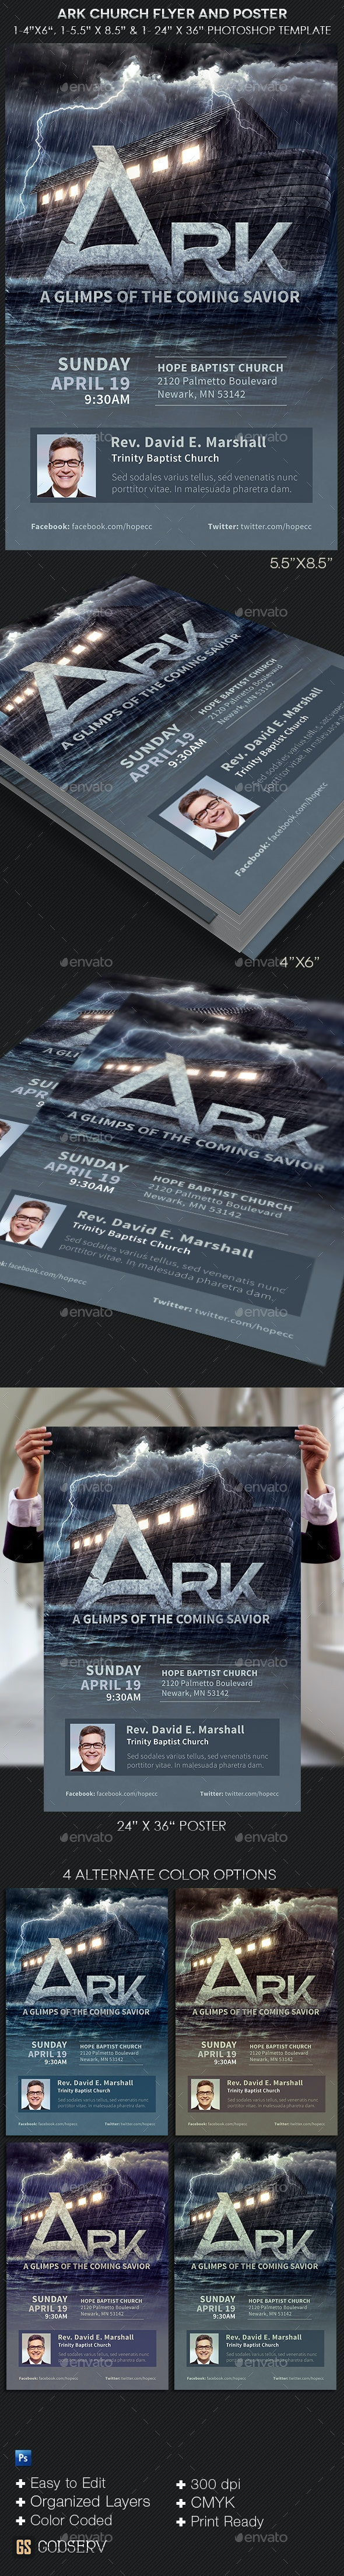 Ark Church Flyer Poster Template - Church Flyers